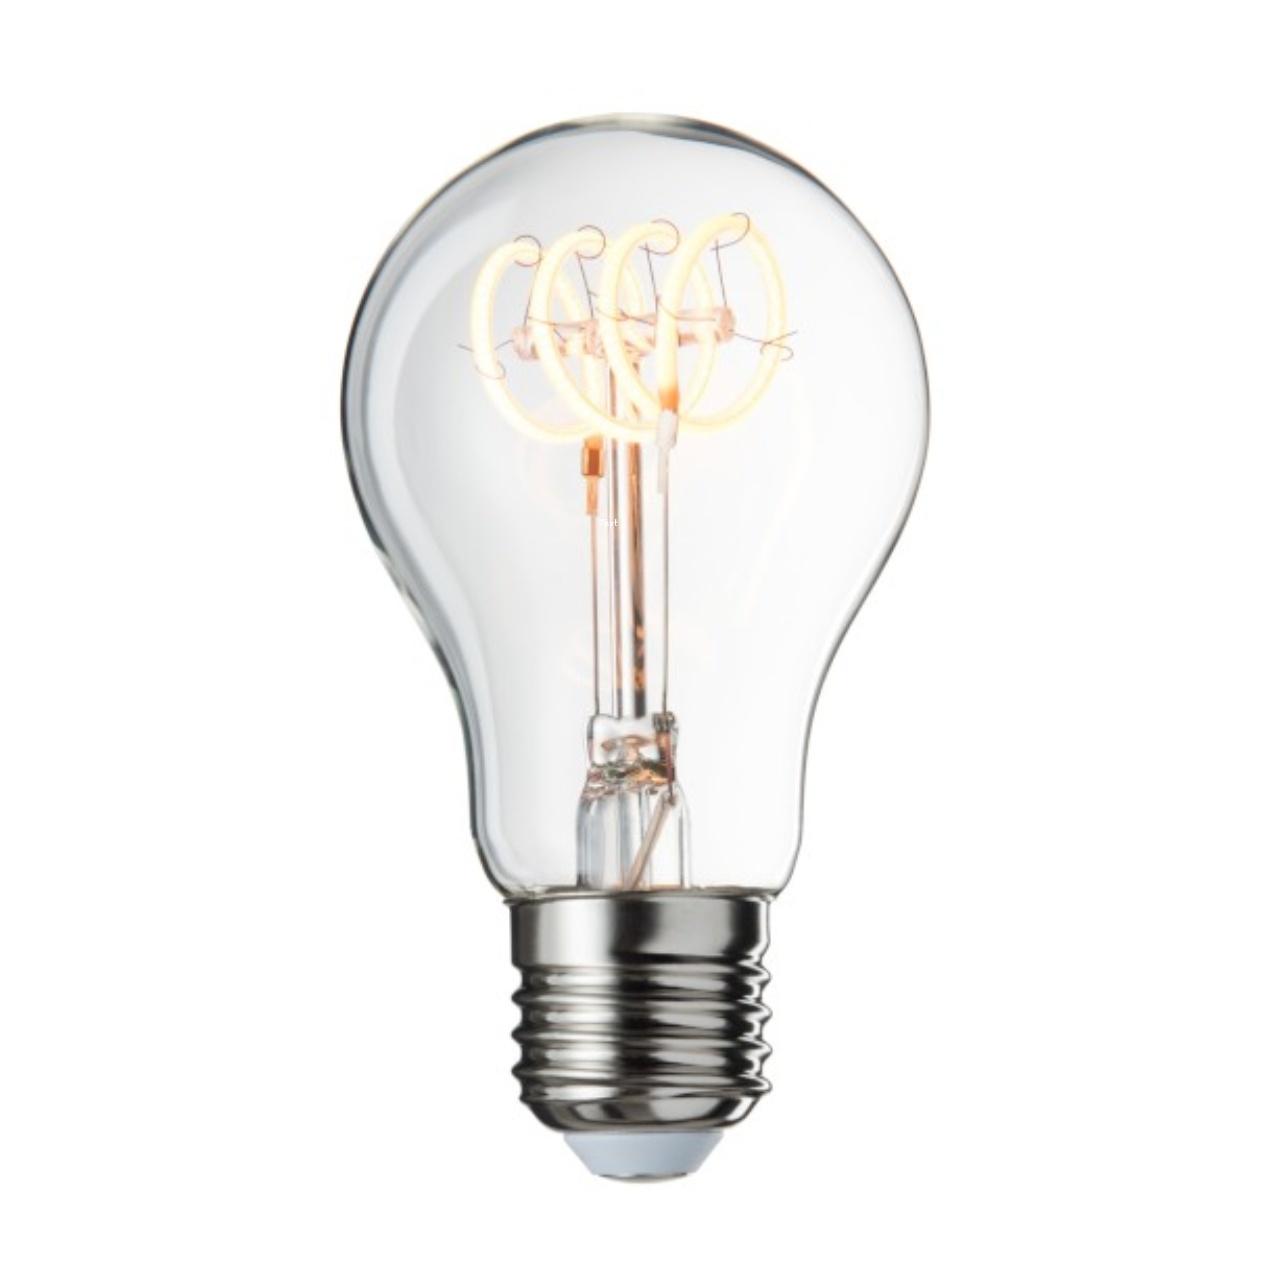 J-line LED E27 4W standaard 10 cm filament lichtbron-78816-5415203788160